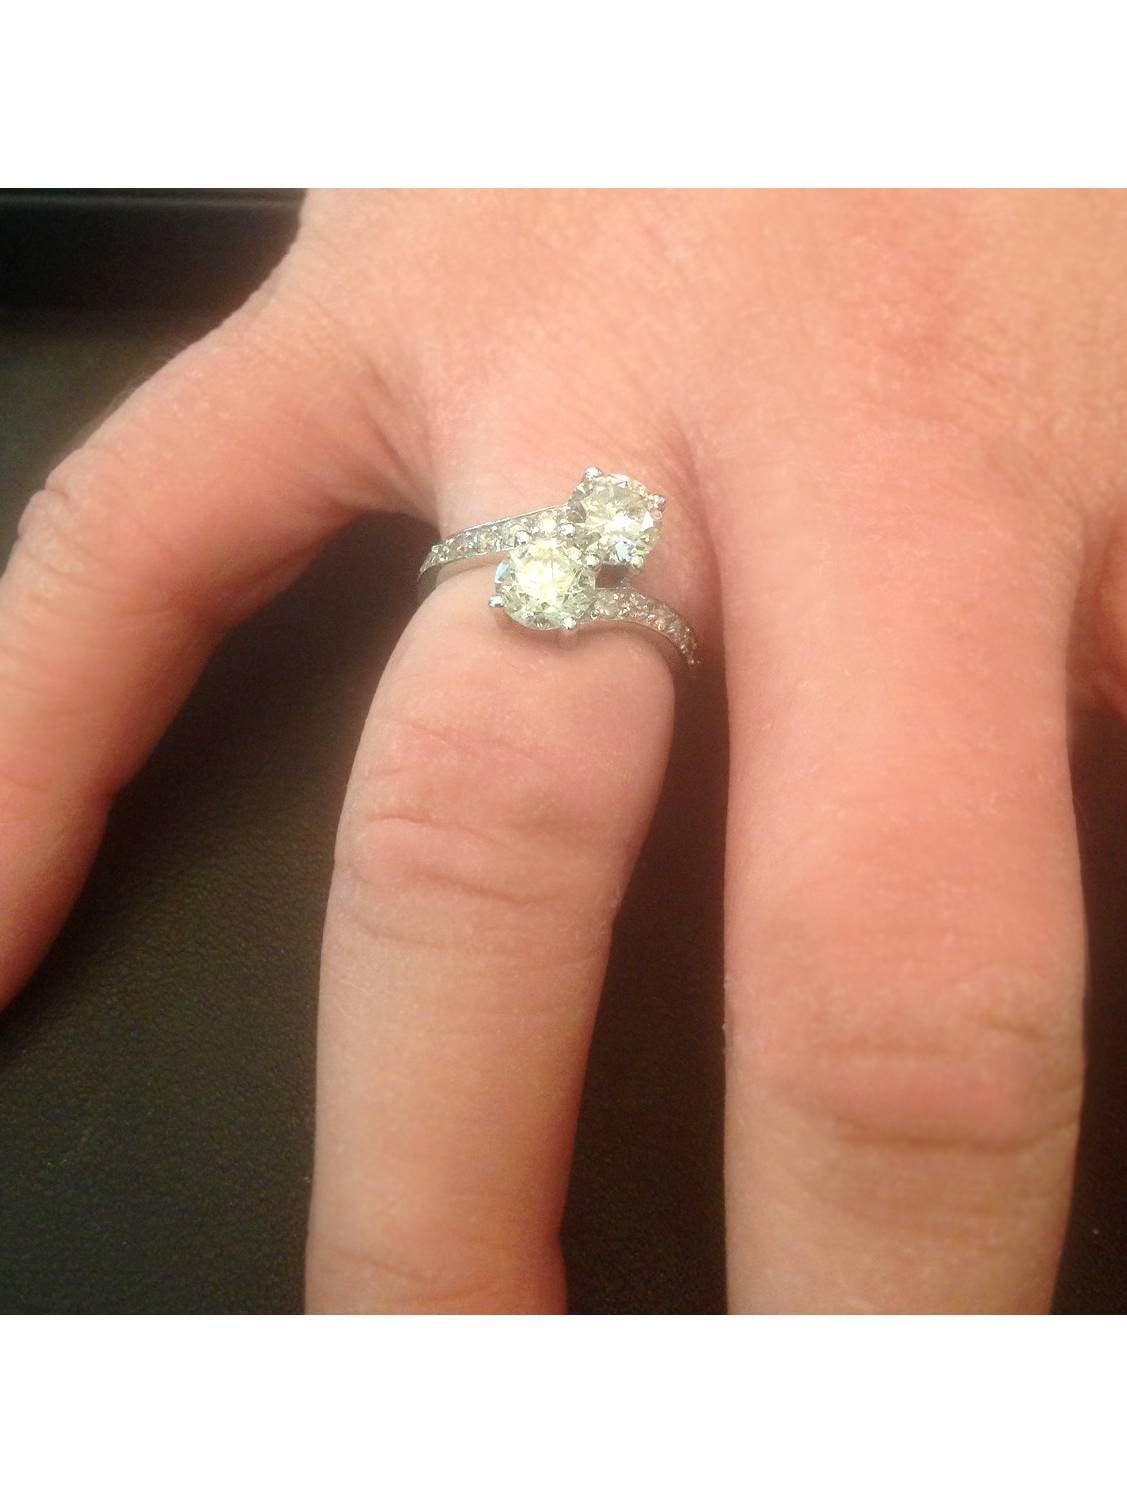 Pompeii3 2 Carat Forever Us Two Stone Engagement Diamond Solitaire Stocking Ring 9919 14k White Gold